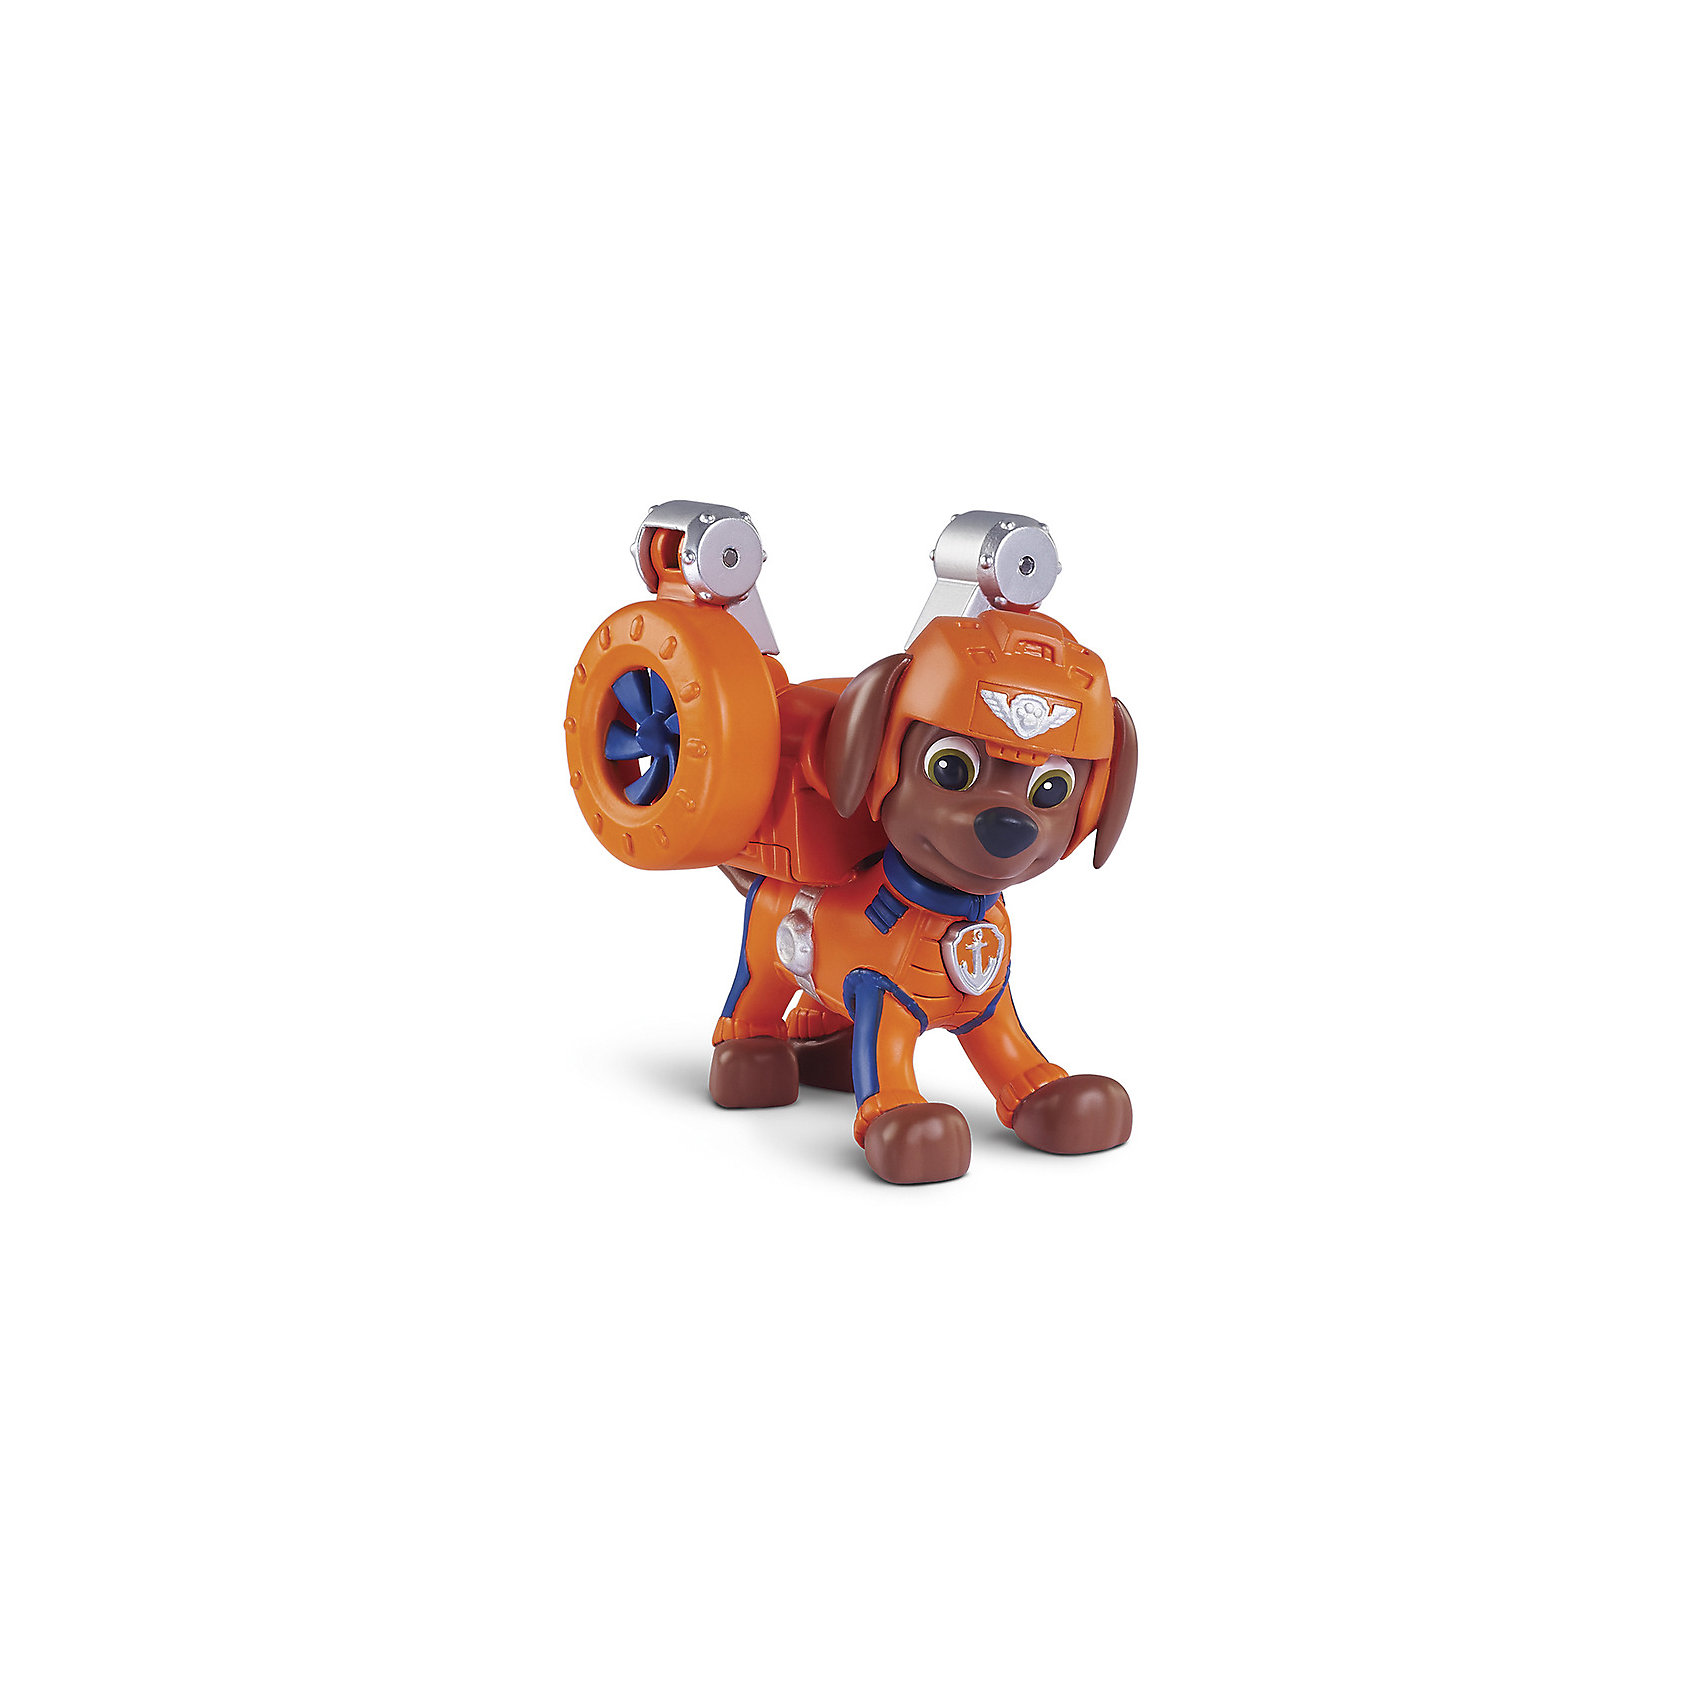 Spin Master Фигурка воздушного спасателя Зума, Щенячий Патруль spin master фигурка спасателя с рюкзаком трансформером щенячий патруль spin master 20070732 16655